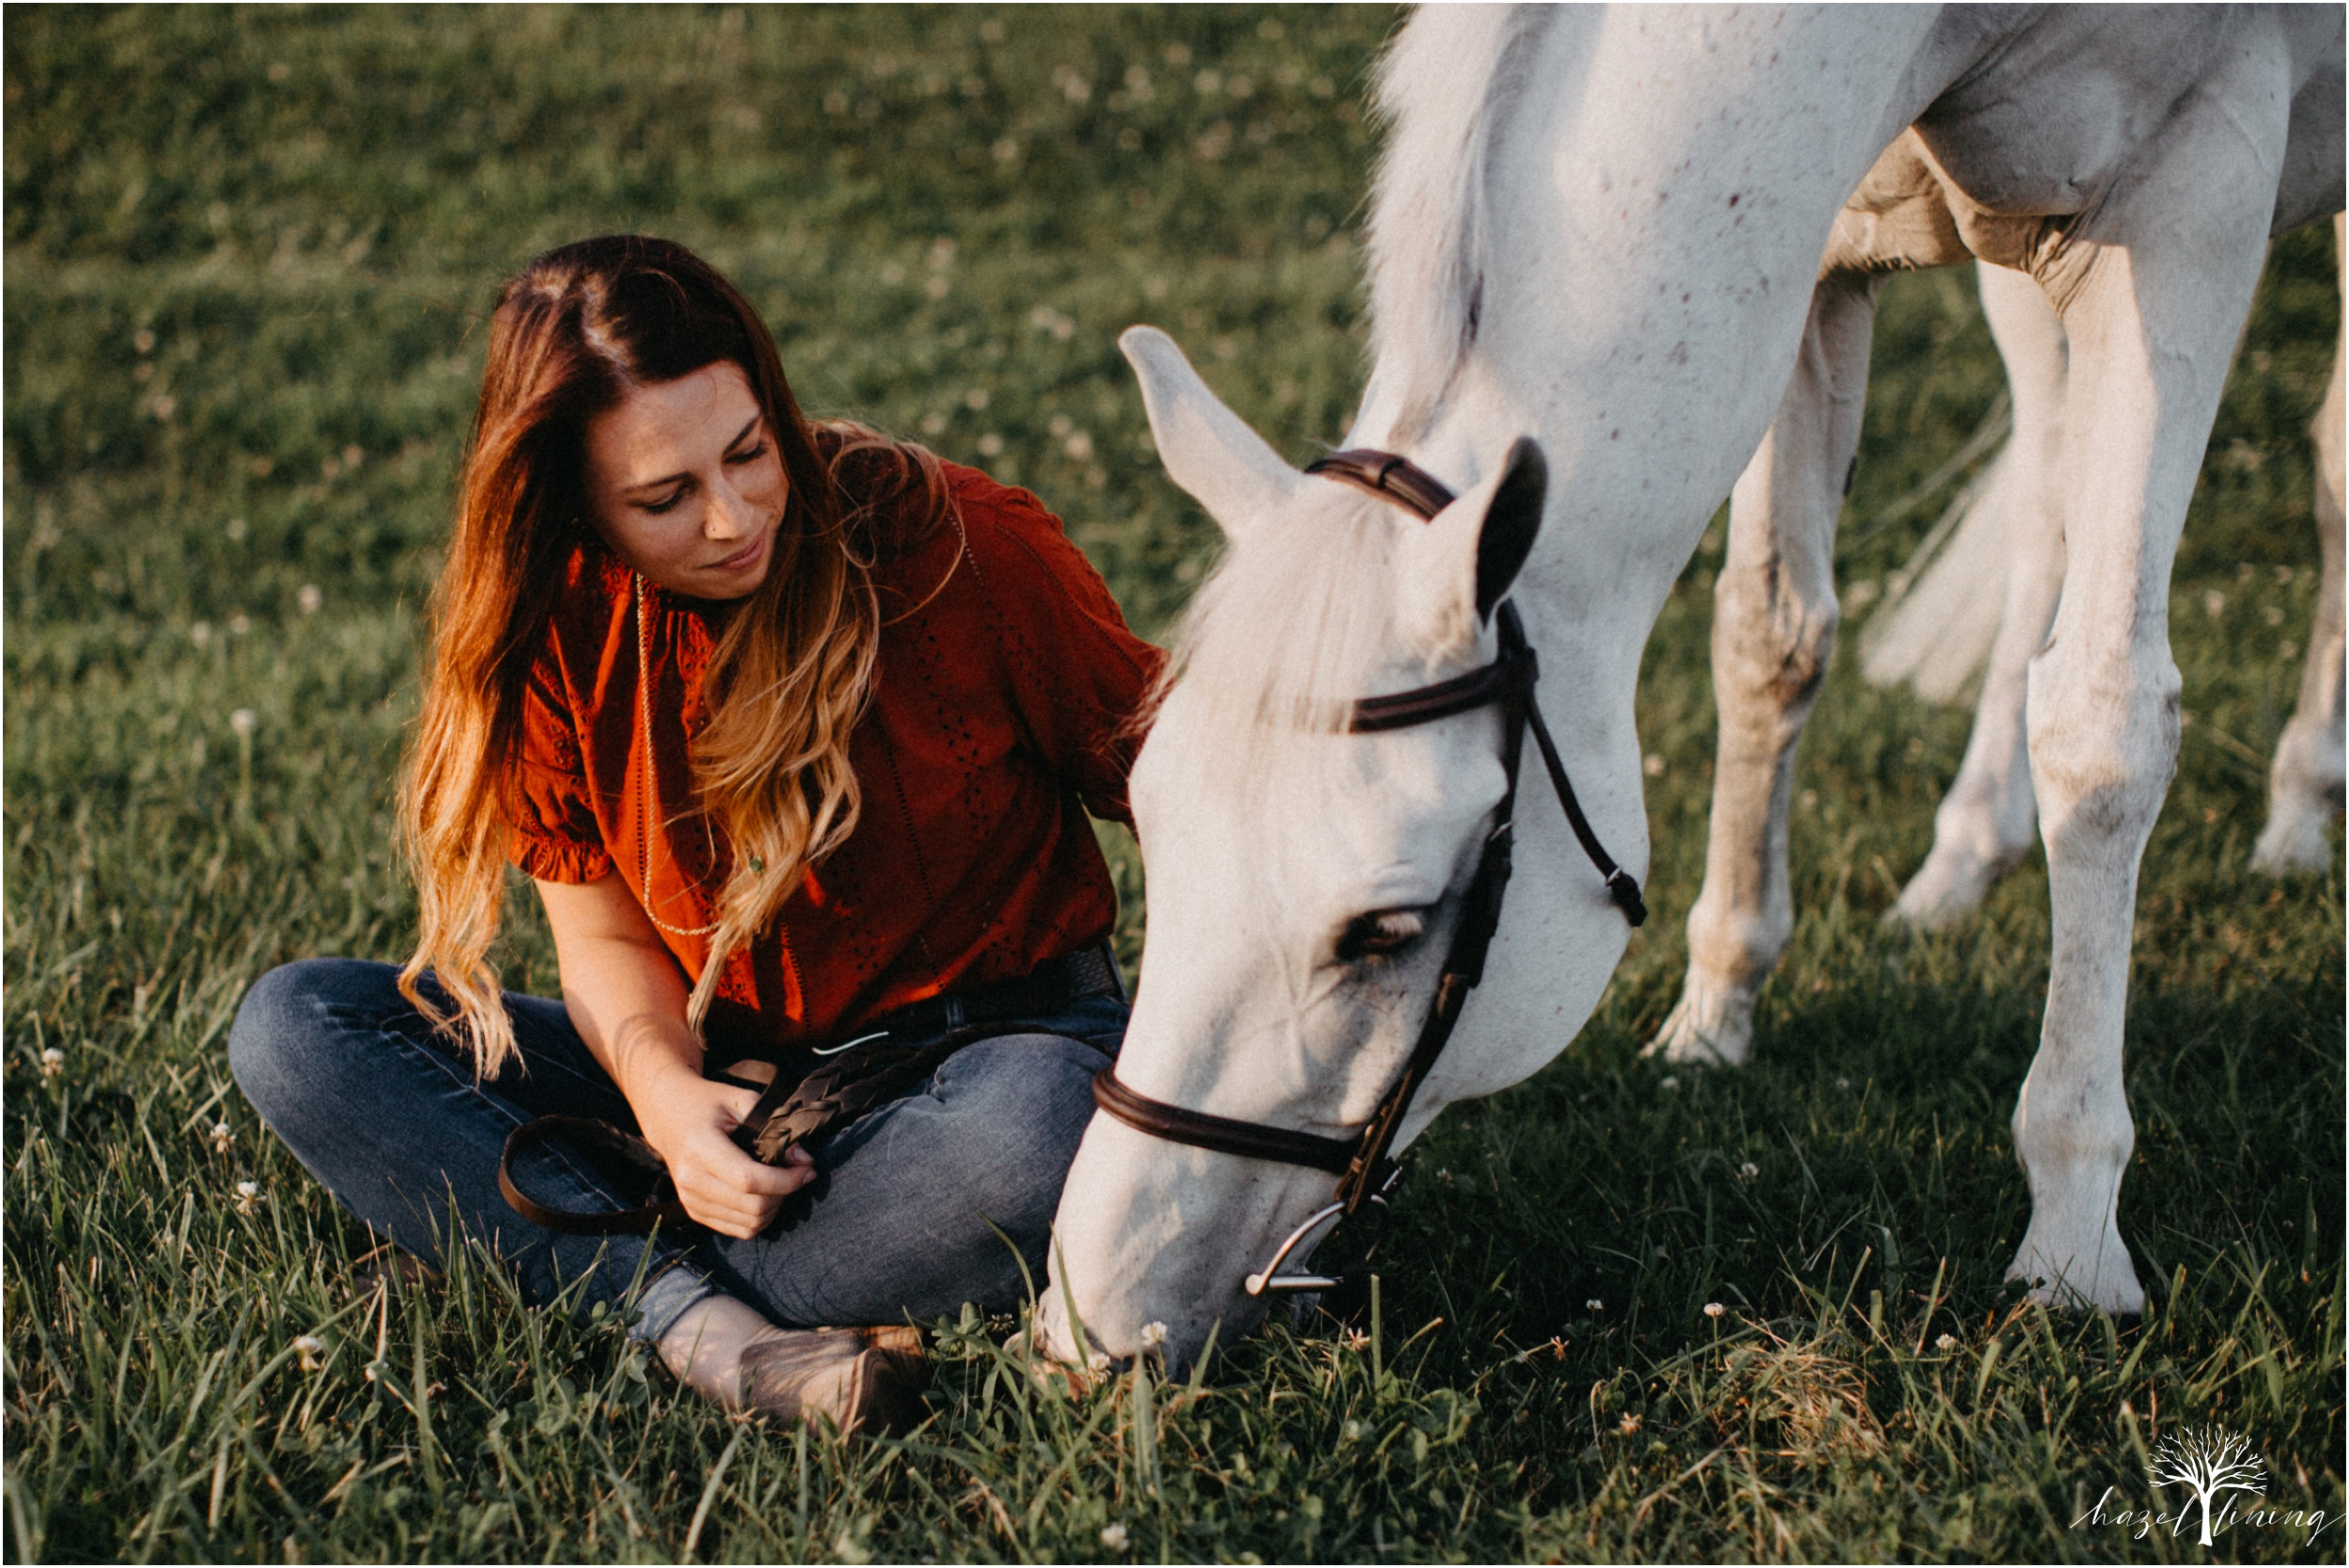 taylor-adams-and-horse-delaware-valley-university-delval-summer-equestrian-portrait-session-hazel-lining-photography-destination-elopement-wedding-engagement-photography_0022.jpg